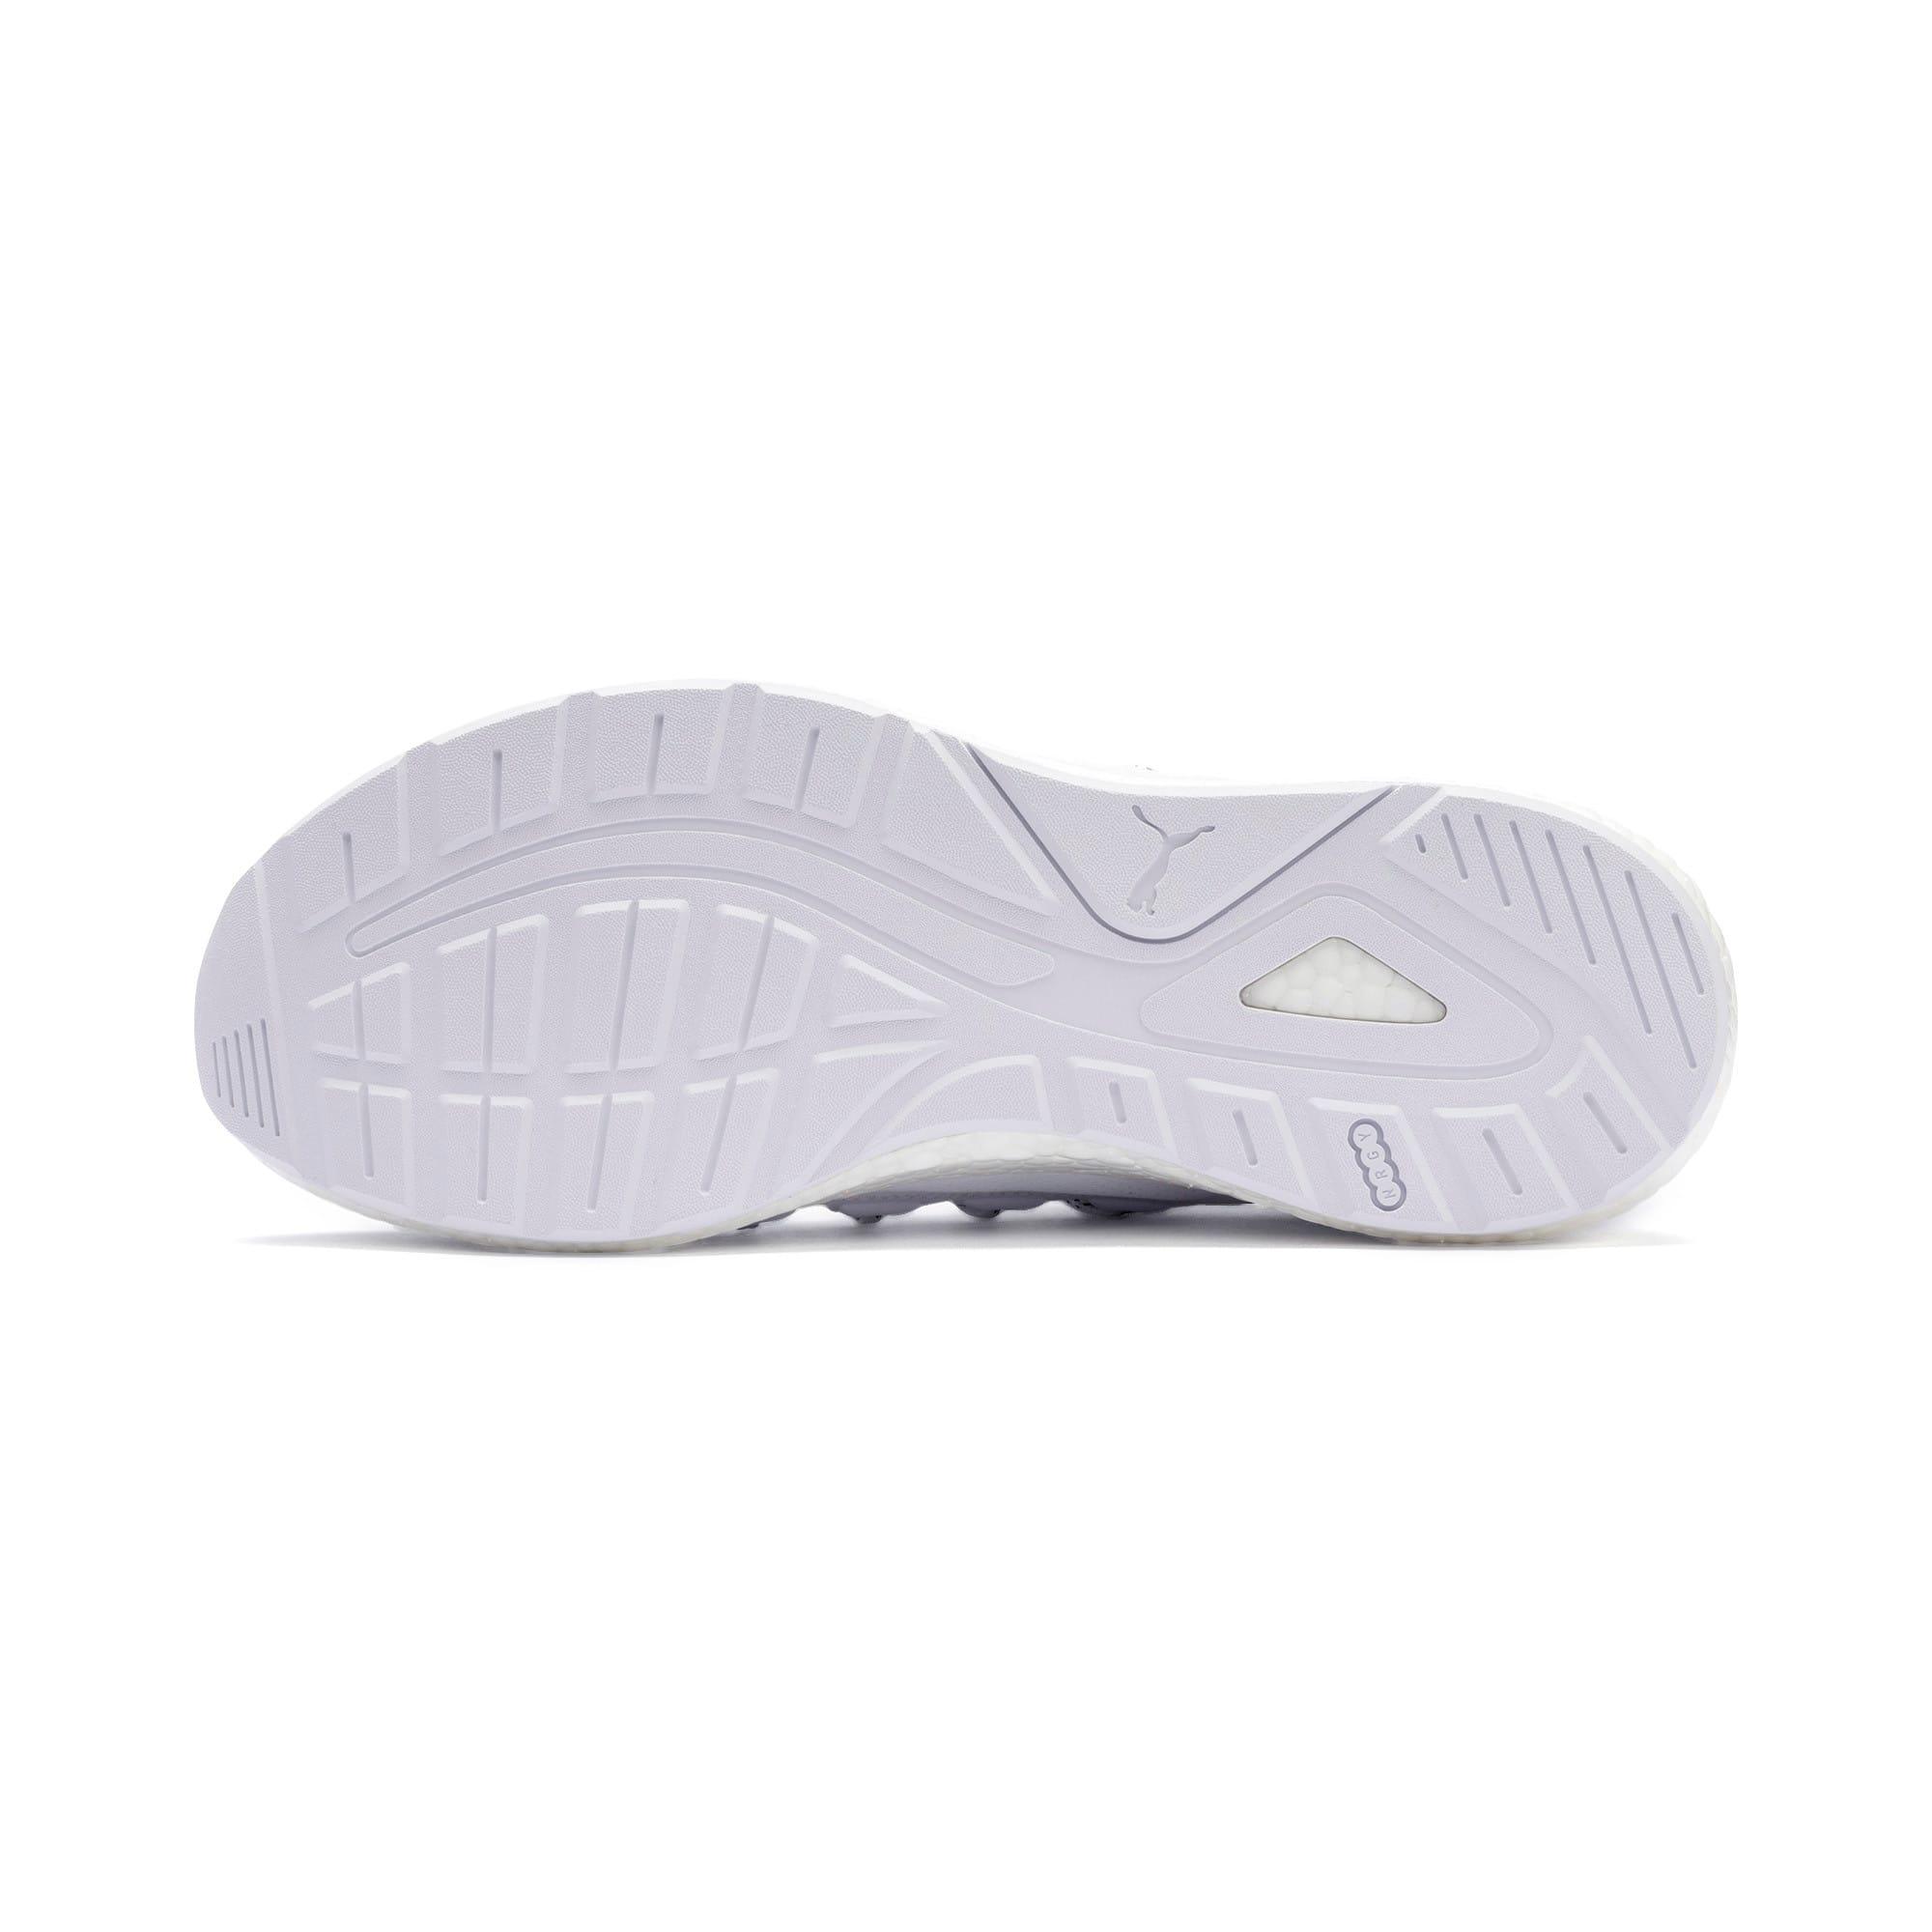 Thumbnail 5 of NRGY Neko Lights Men's Running Shoes, Puma White, medium